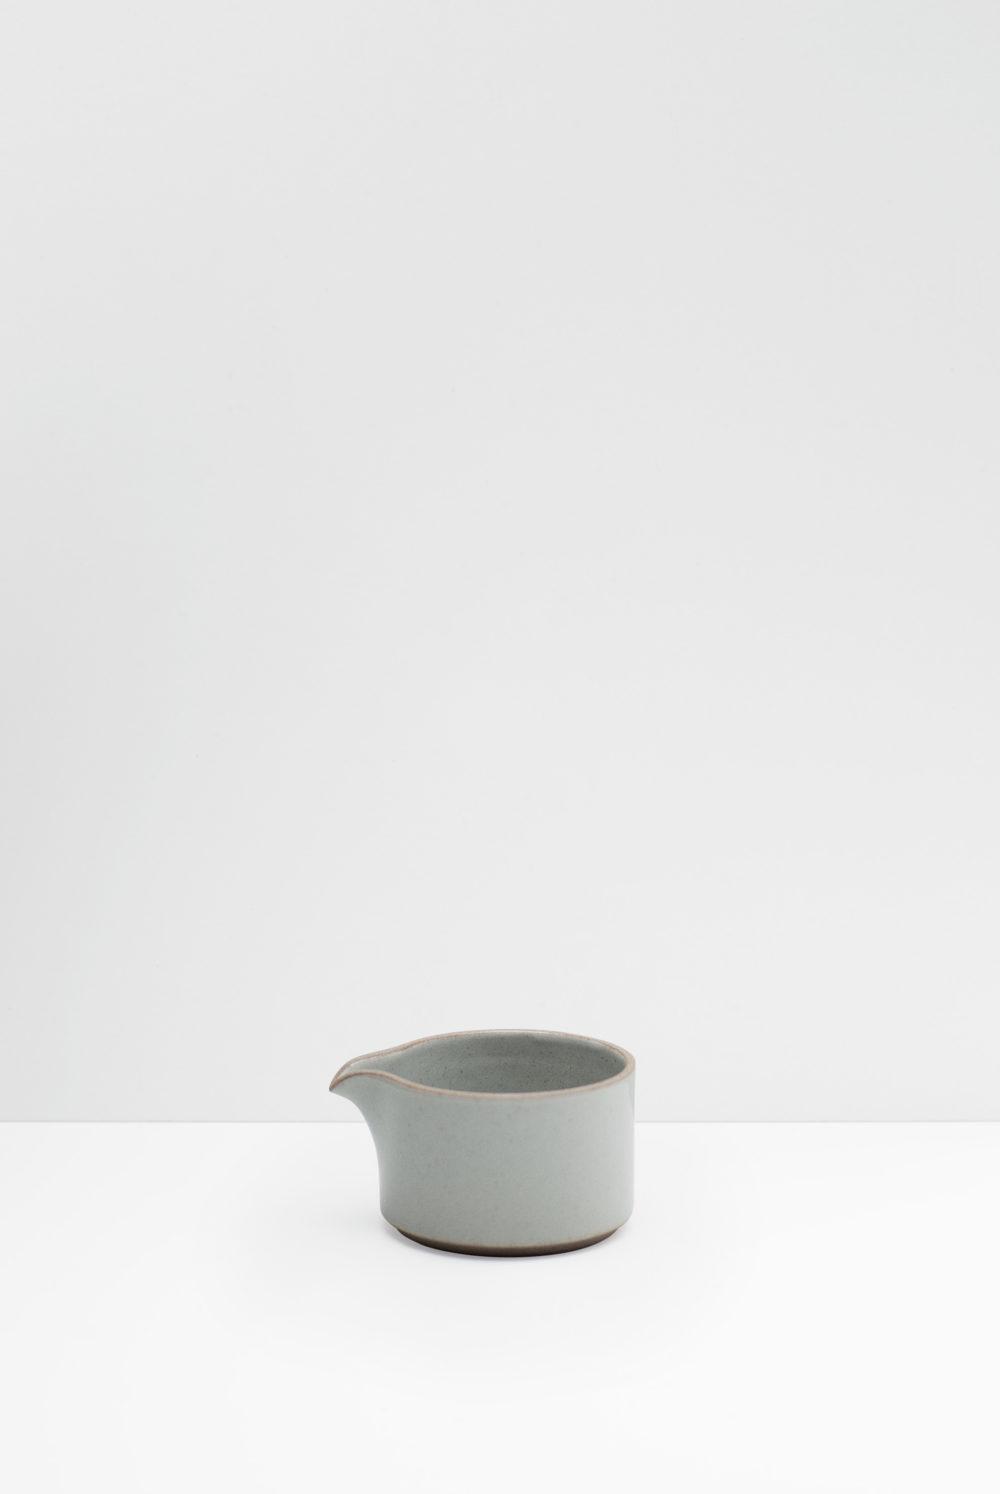 Hasami Porcelain milk pitcher gray glazed